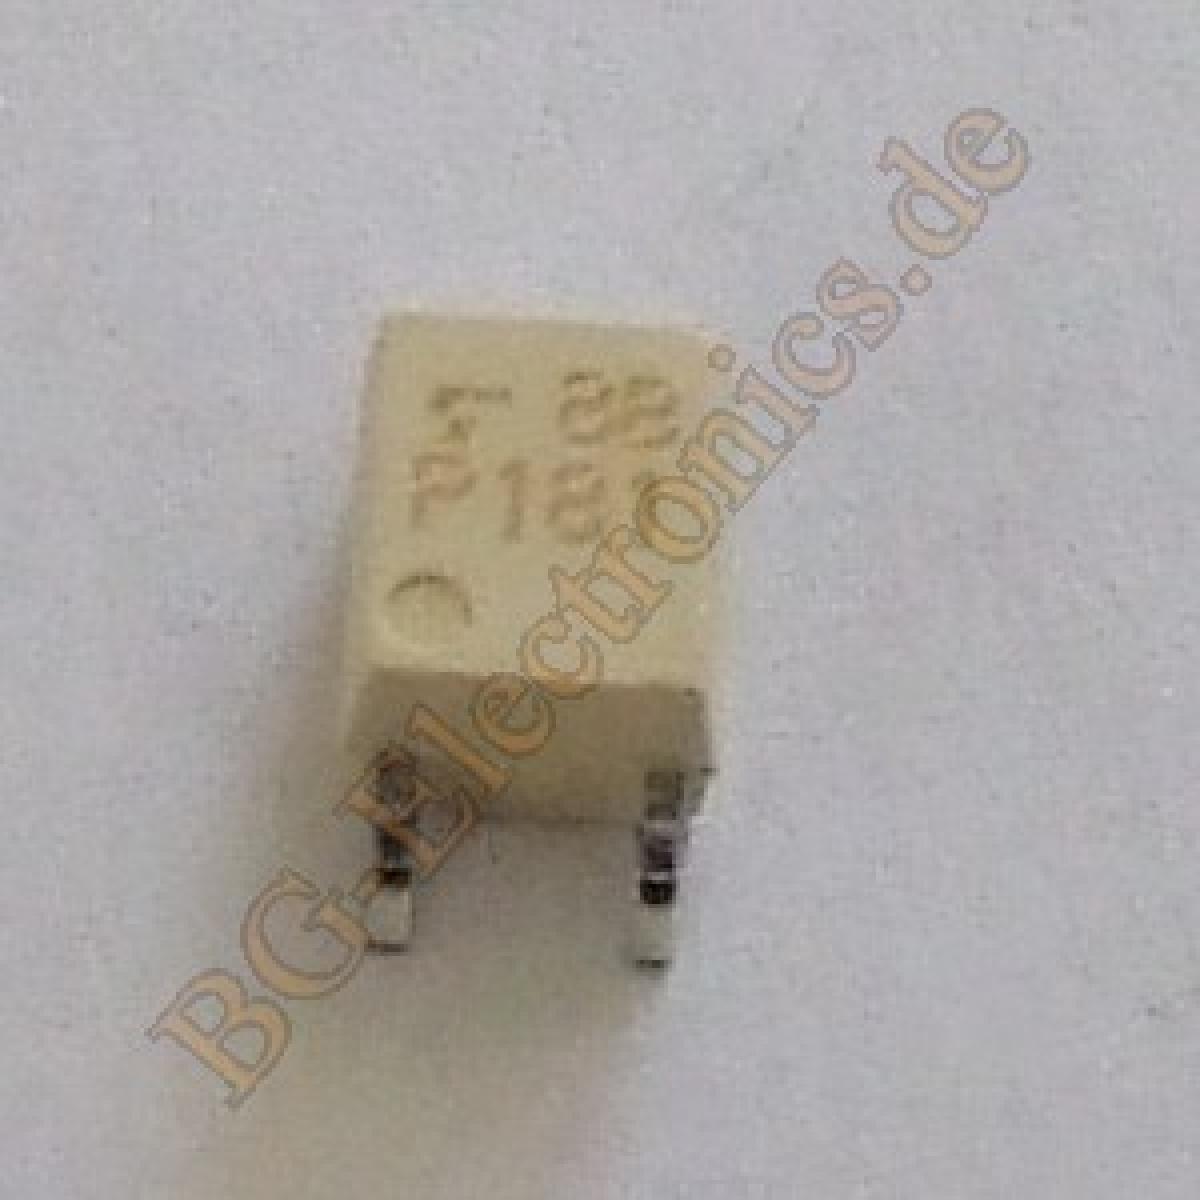 2-x-TLP181-Photocoupler-GaAs-Ired-Photo-Transistor-150mW-Toshiba-SO-4-2pcs